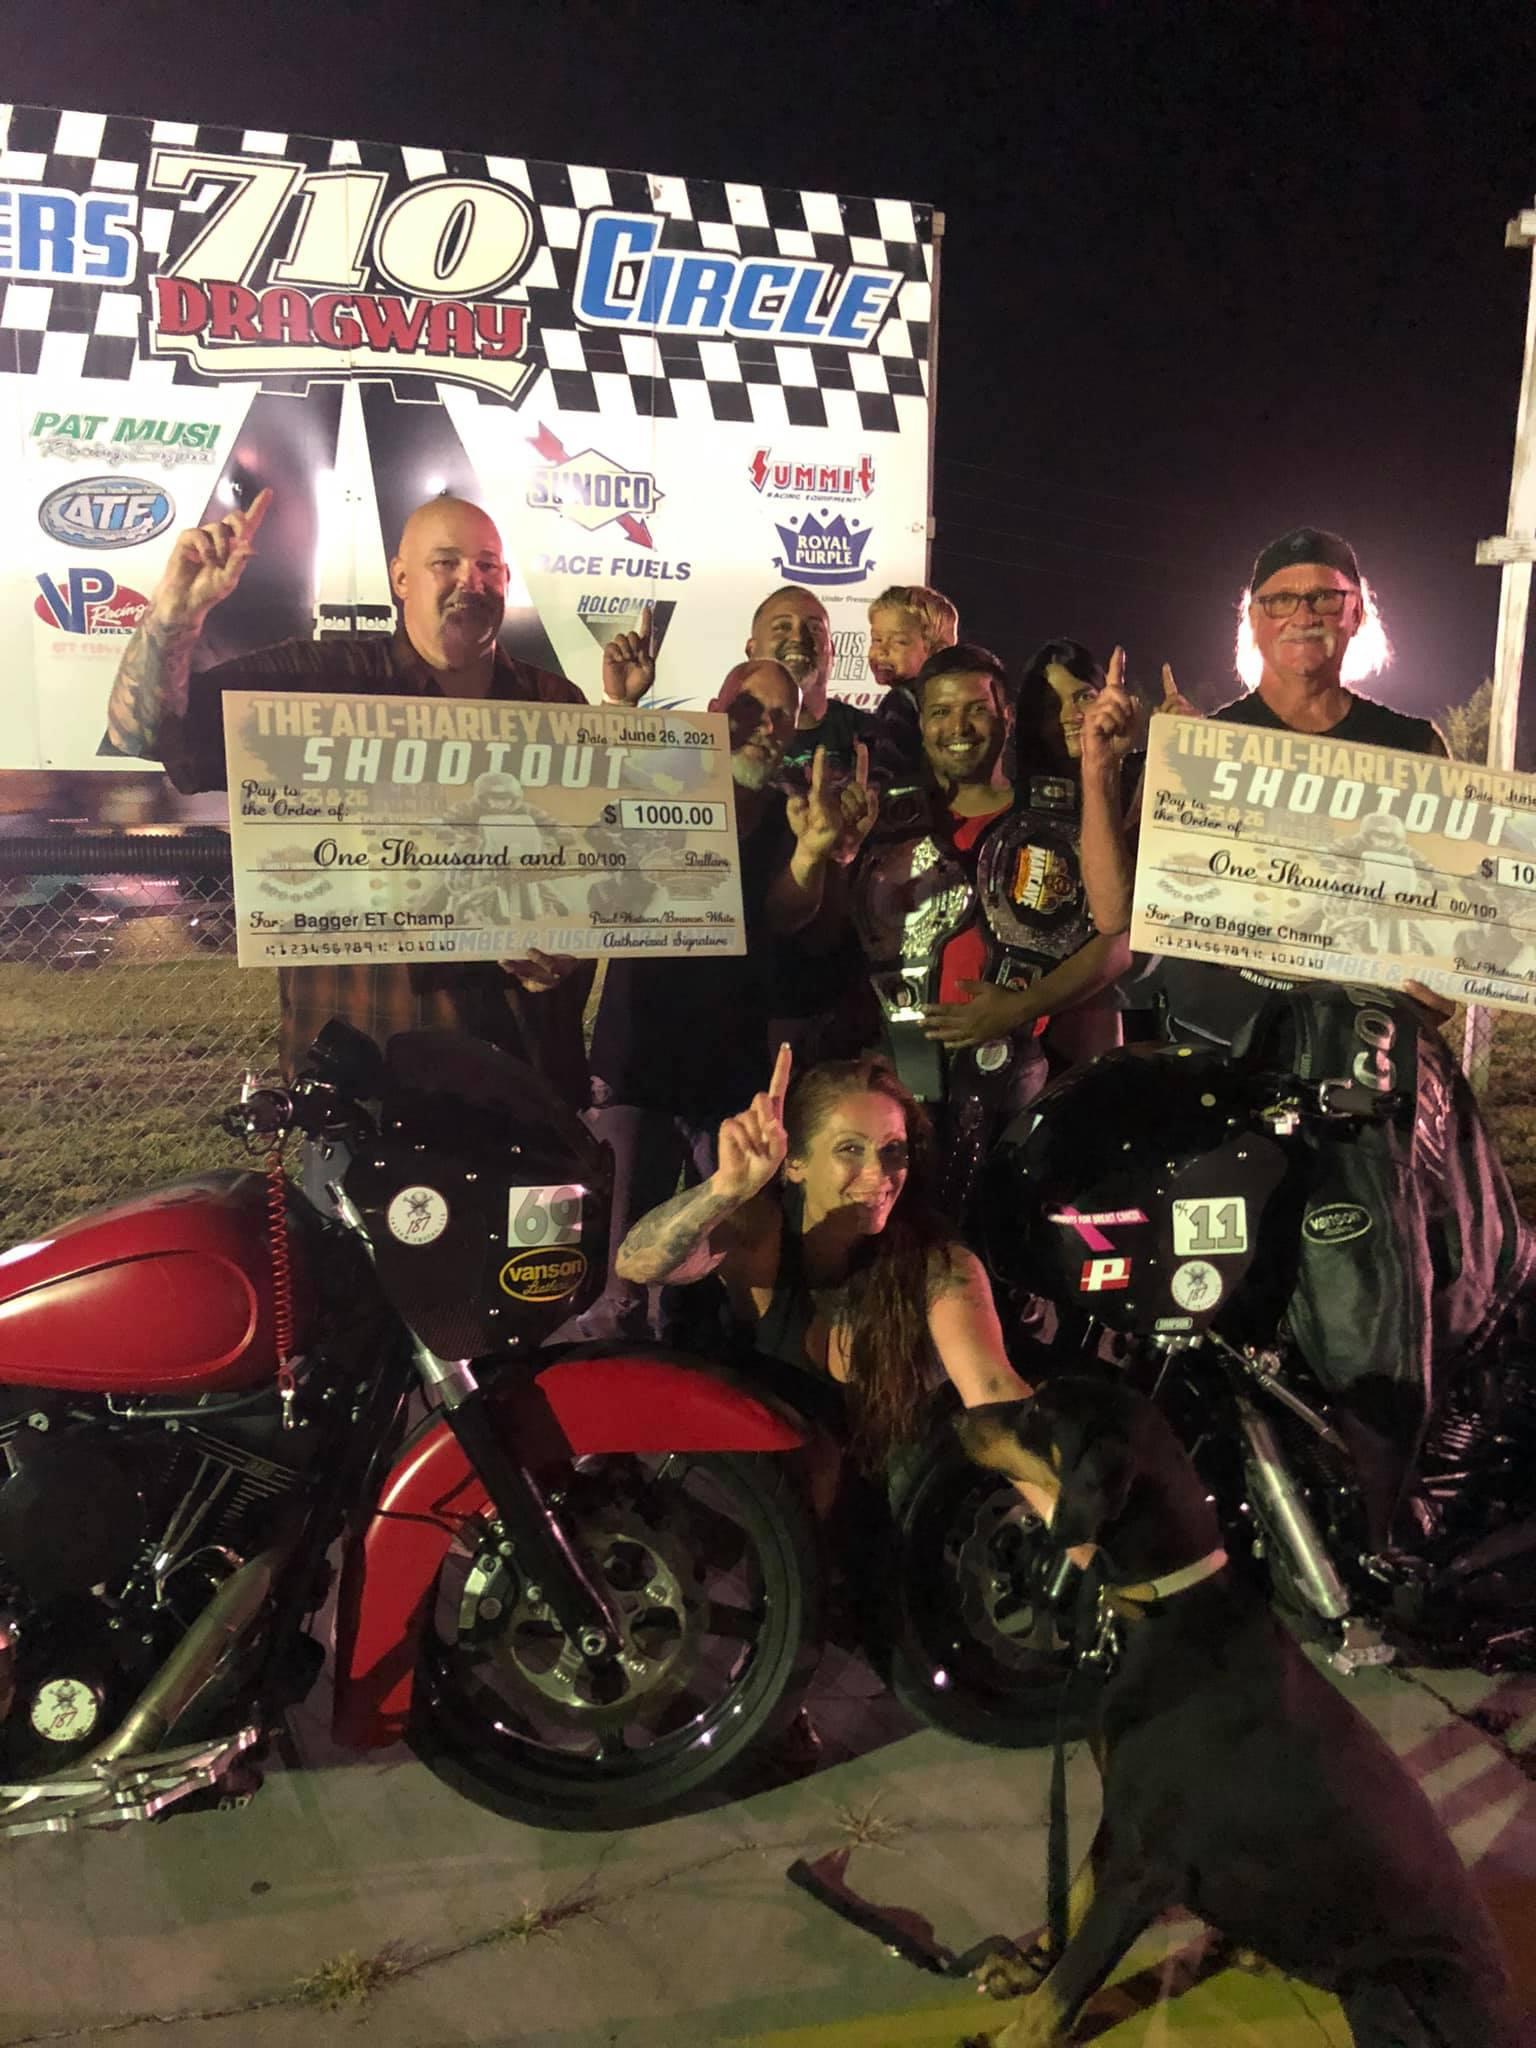 All Harley World Shootout